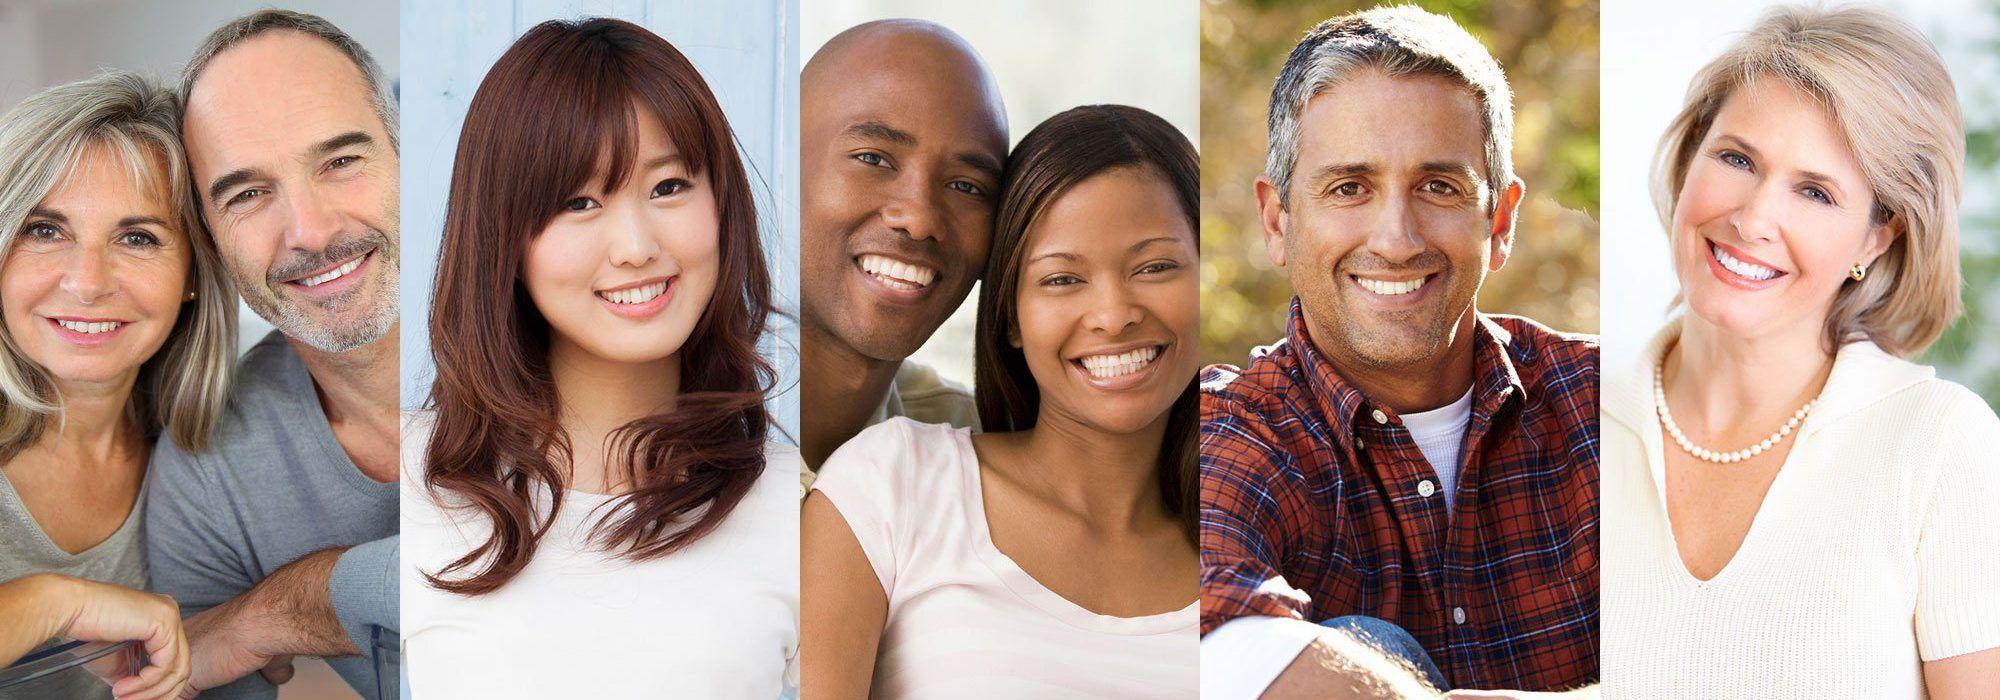 40++ Lakewood dental arts ohio info